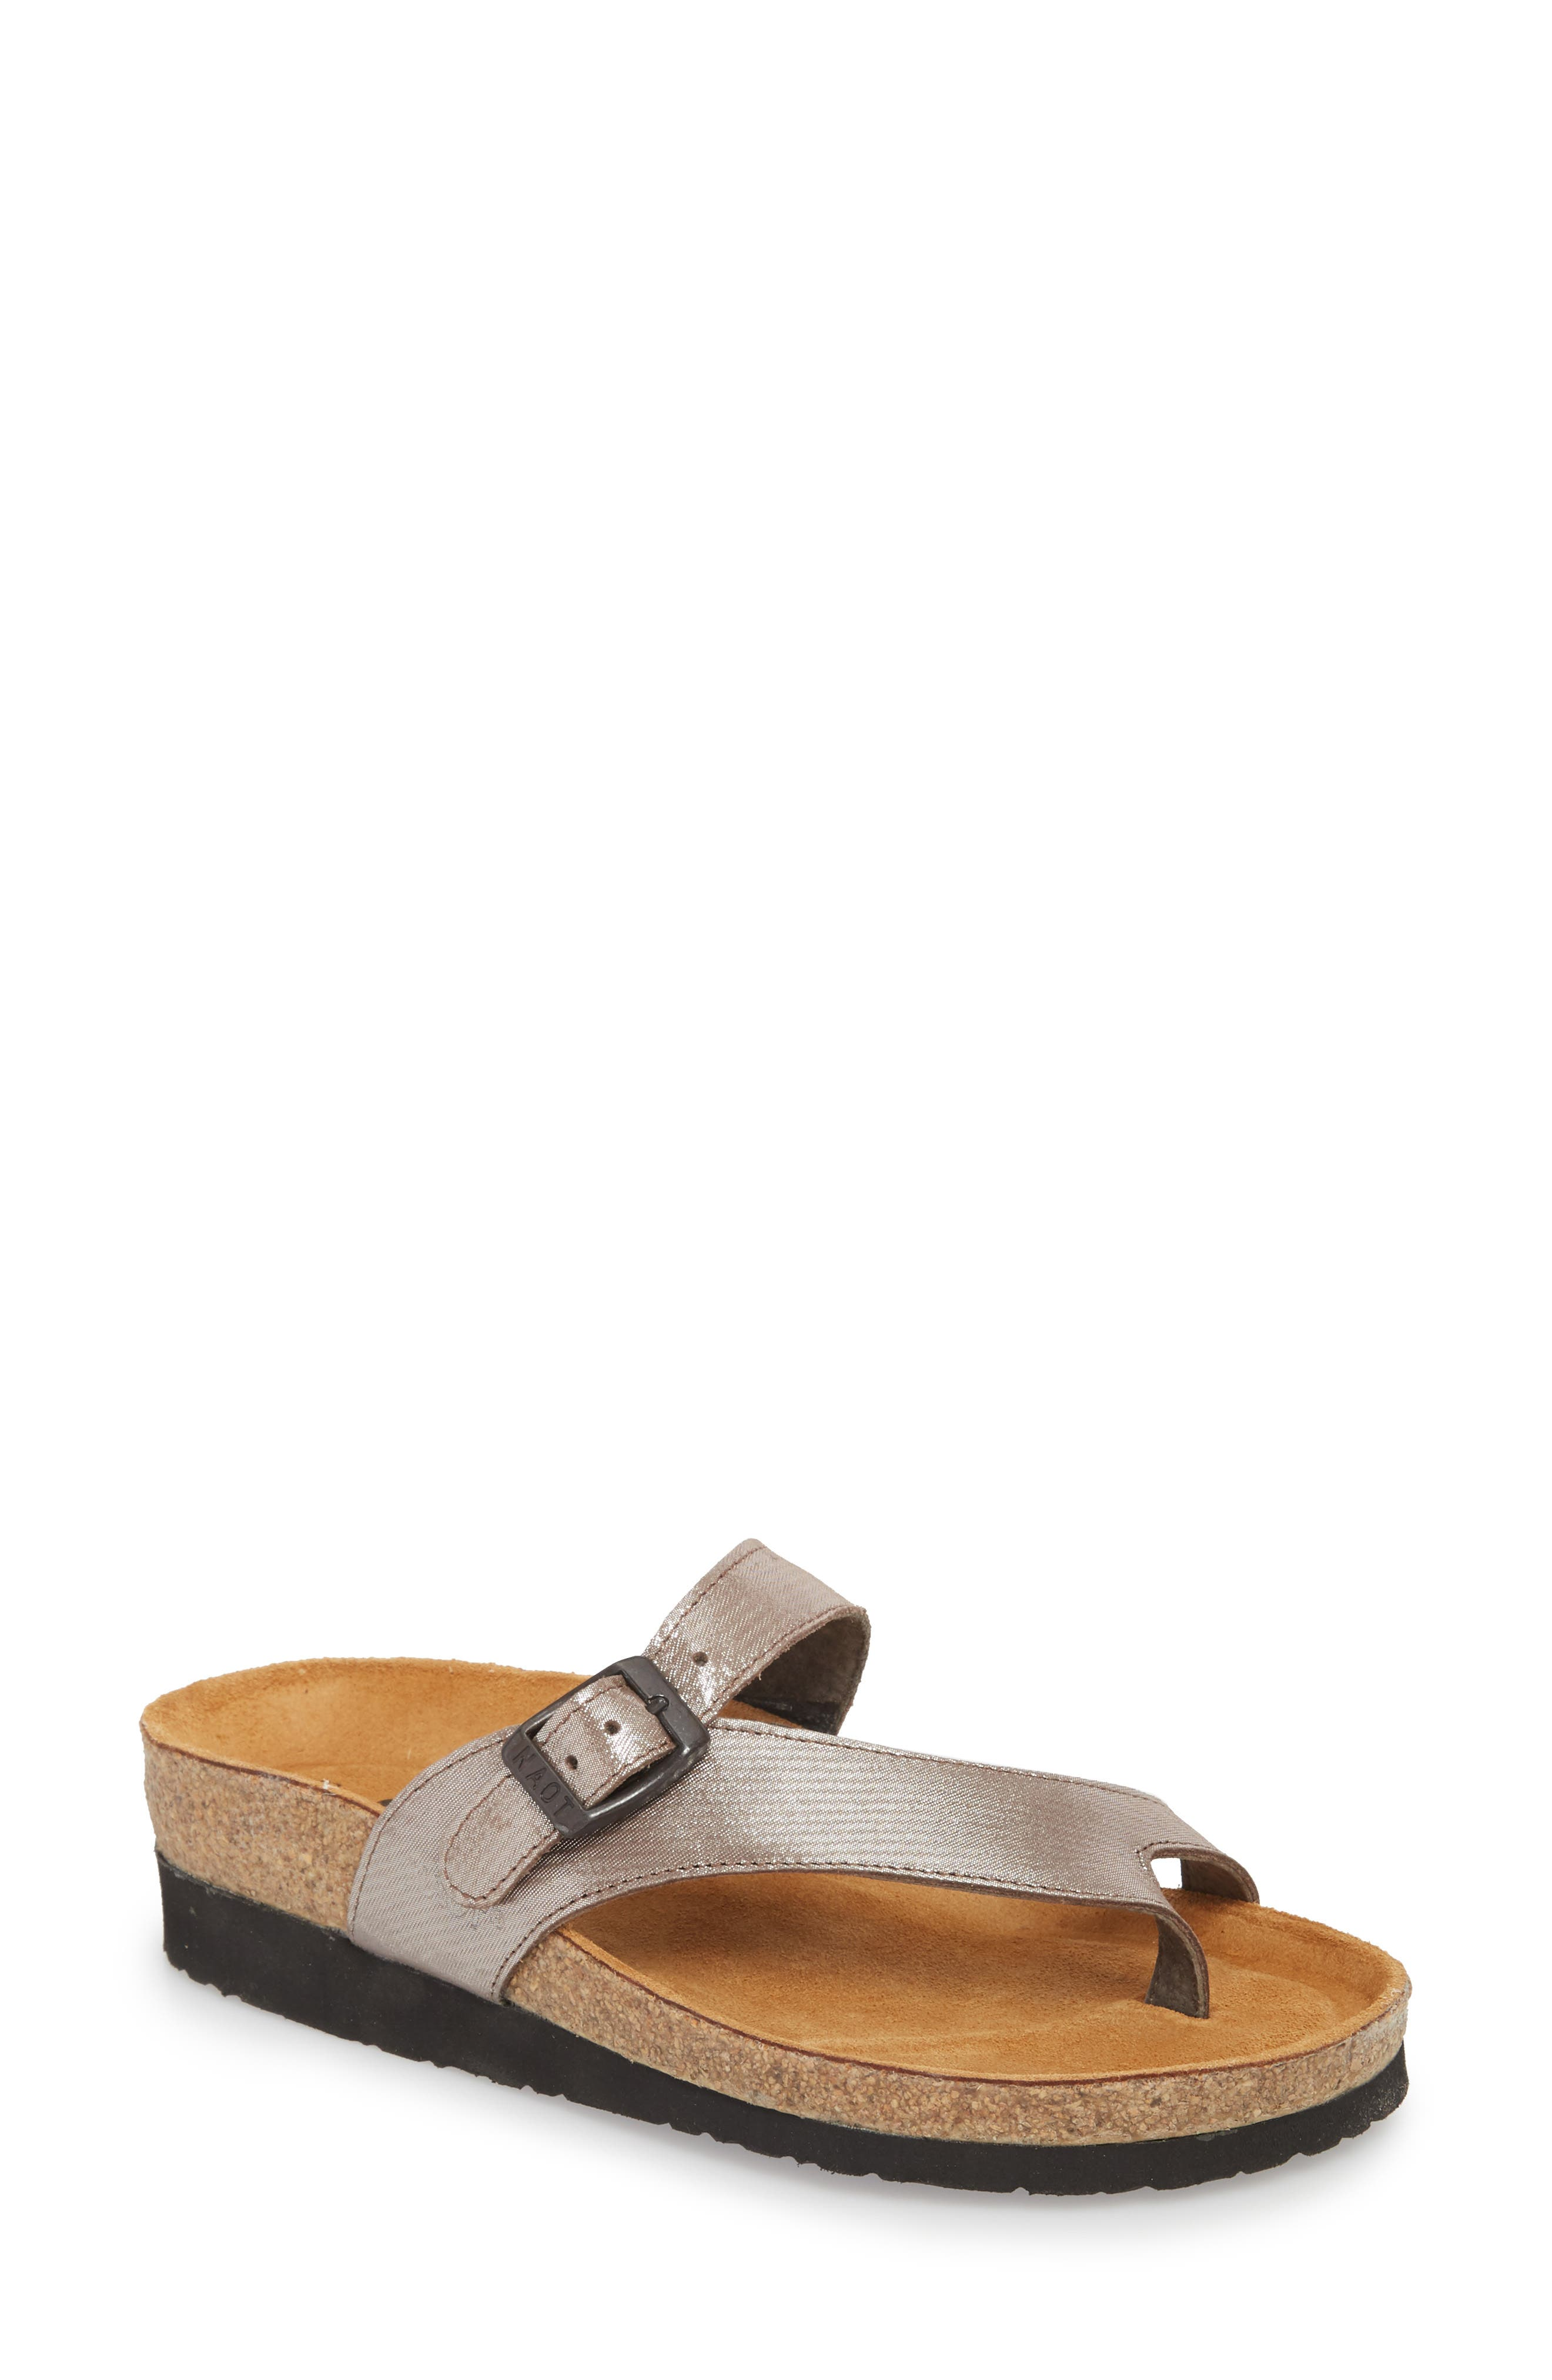 'Tahoe' Sandal,                             Main thumbnail 1, color,                             Silver Leather